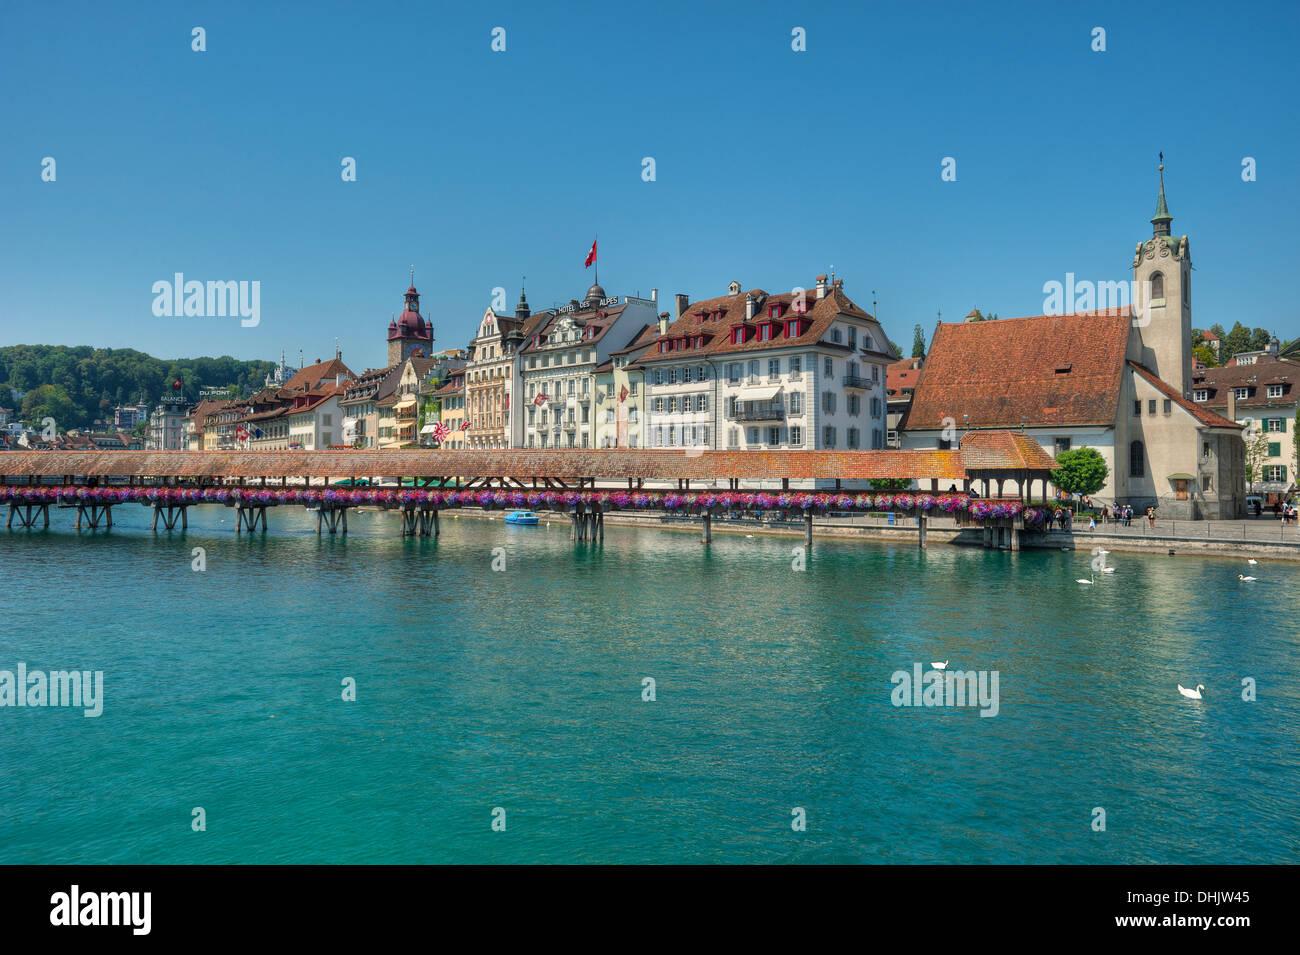 Reuss river with Chapel bridge, Lucerne, Lucerne, Switzerland, Europe - Stock Image